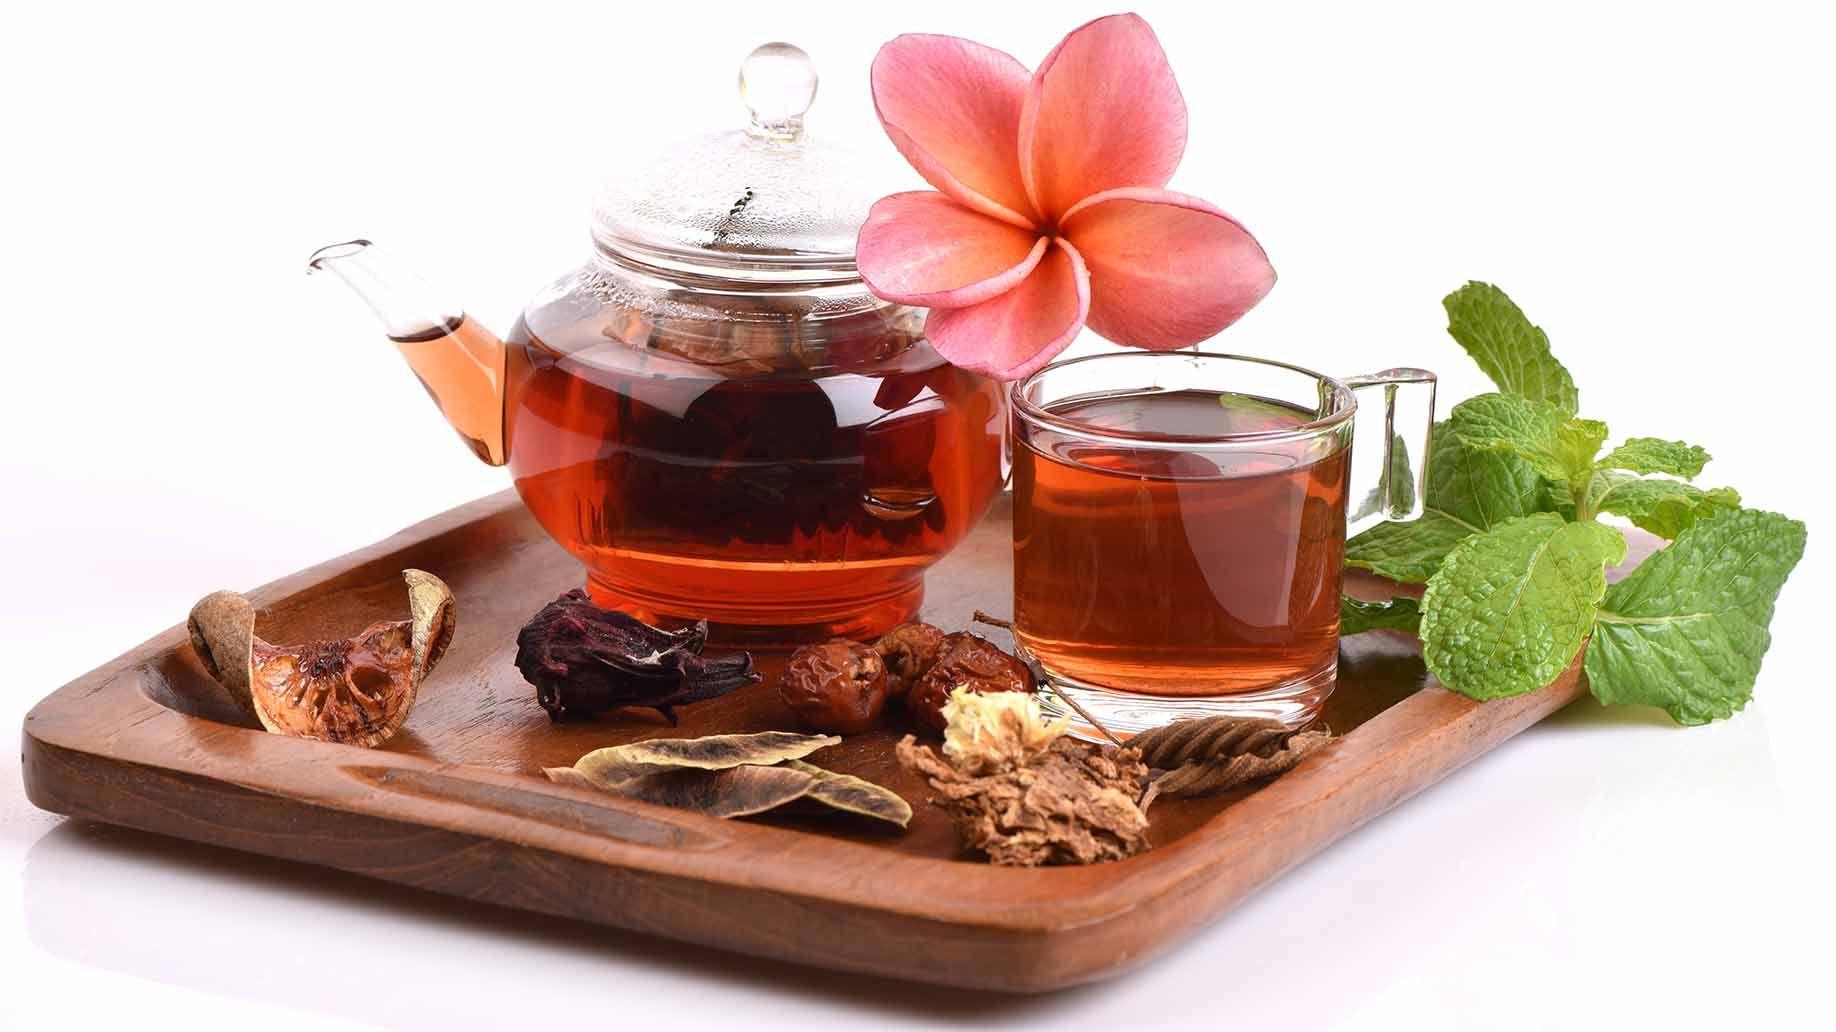 colon-cleanse-diy-detox-food-remove-toxins-naturally.jpg (1836×1032)